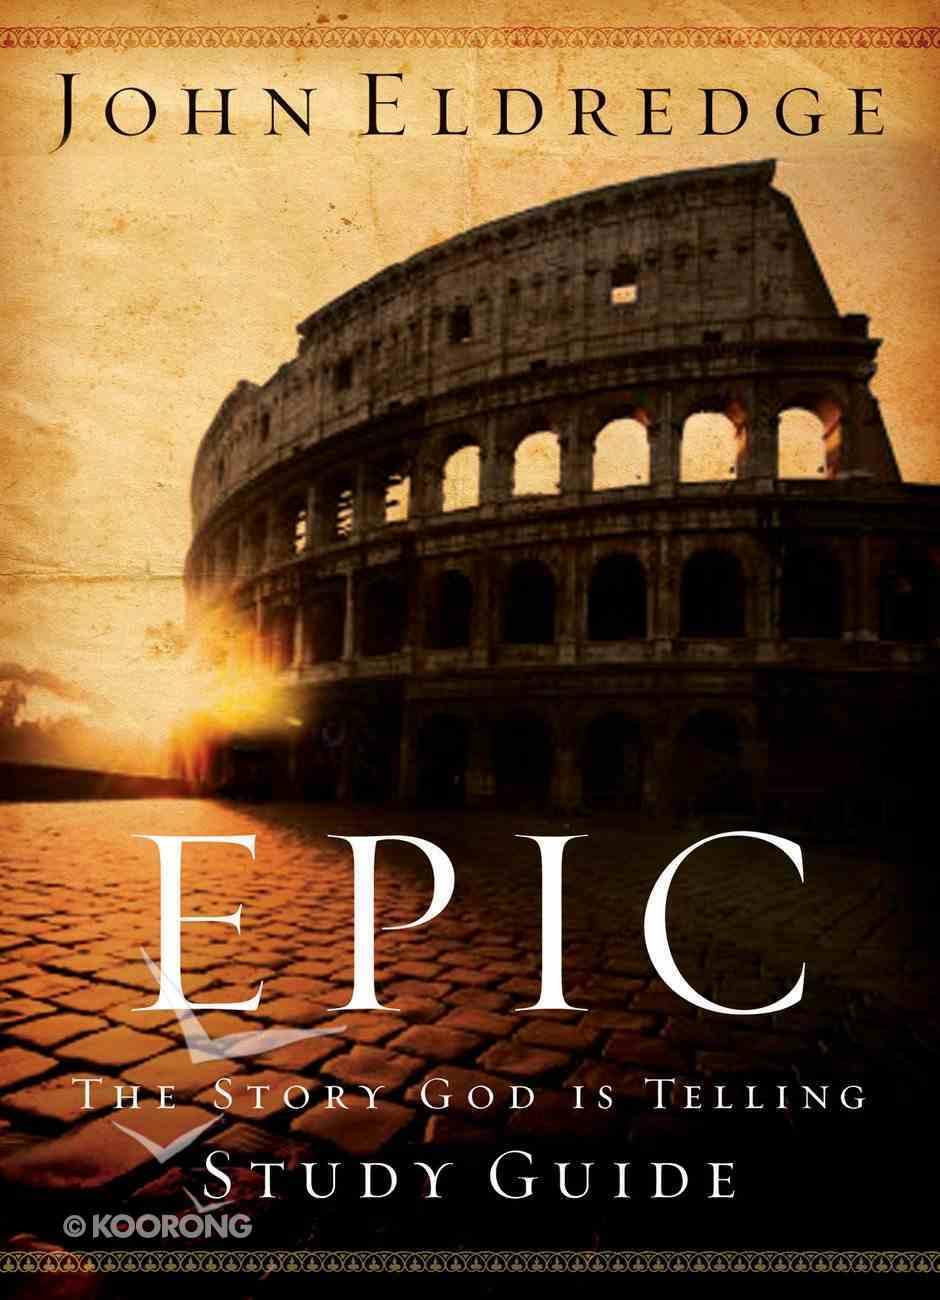 Epic (Study Guide) eBook